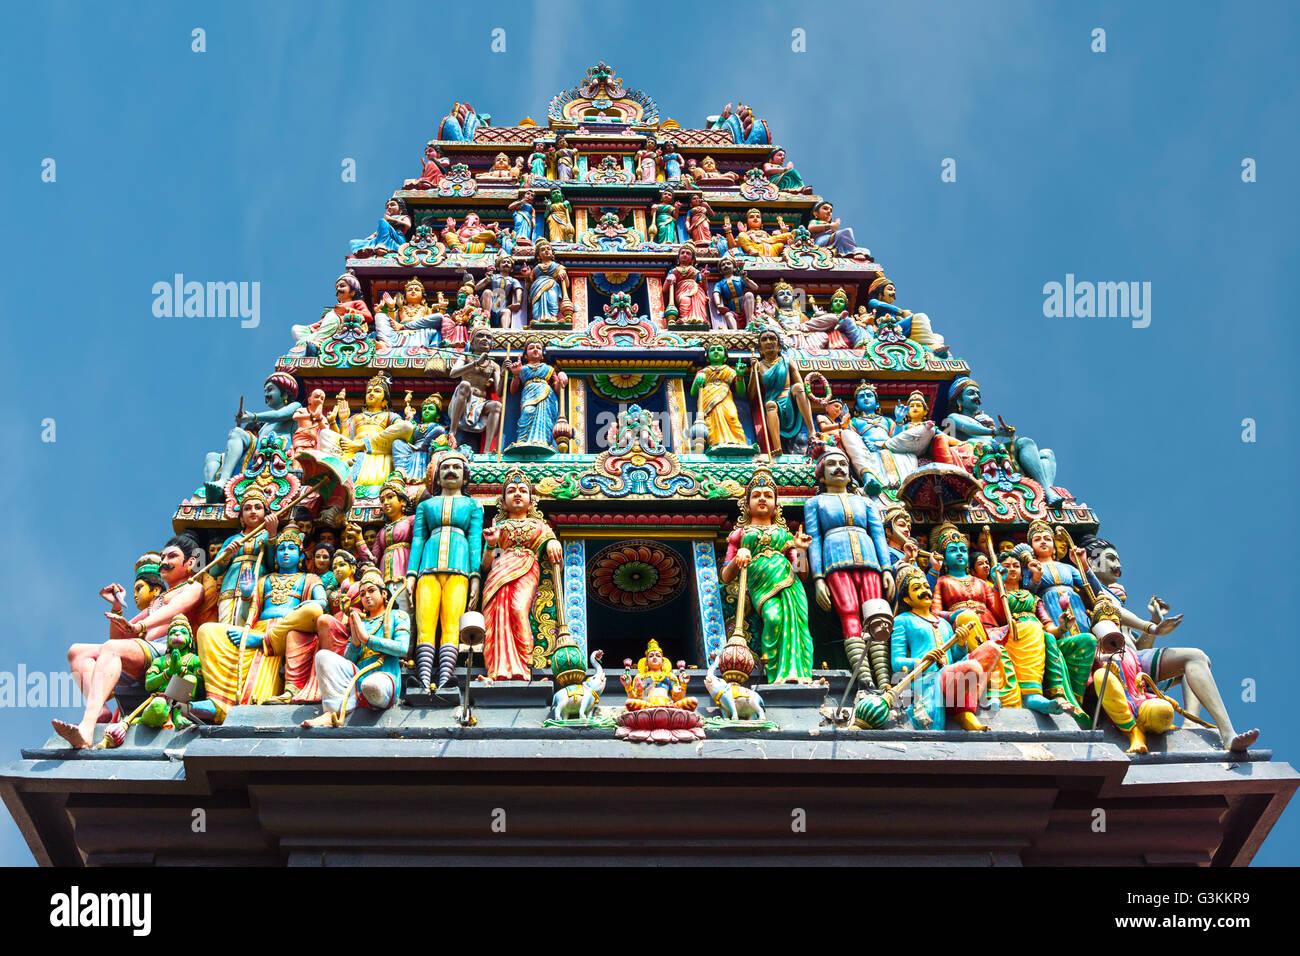 Hindu deities at Sri Mariamman or Mother Goddess Temple, Oldest Hindu Place of Worship, Chinatown, Singapore - Stock Image